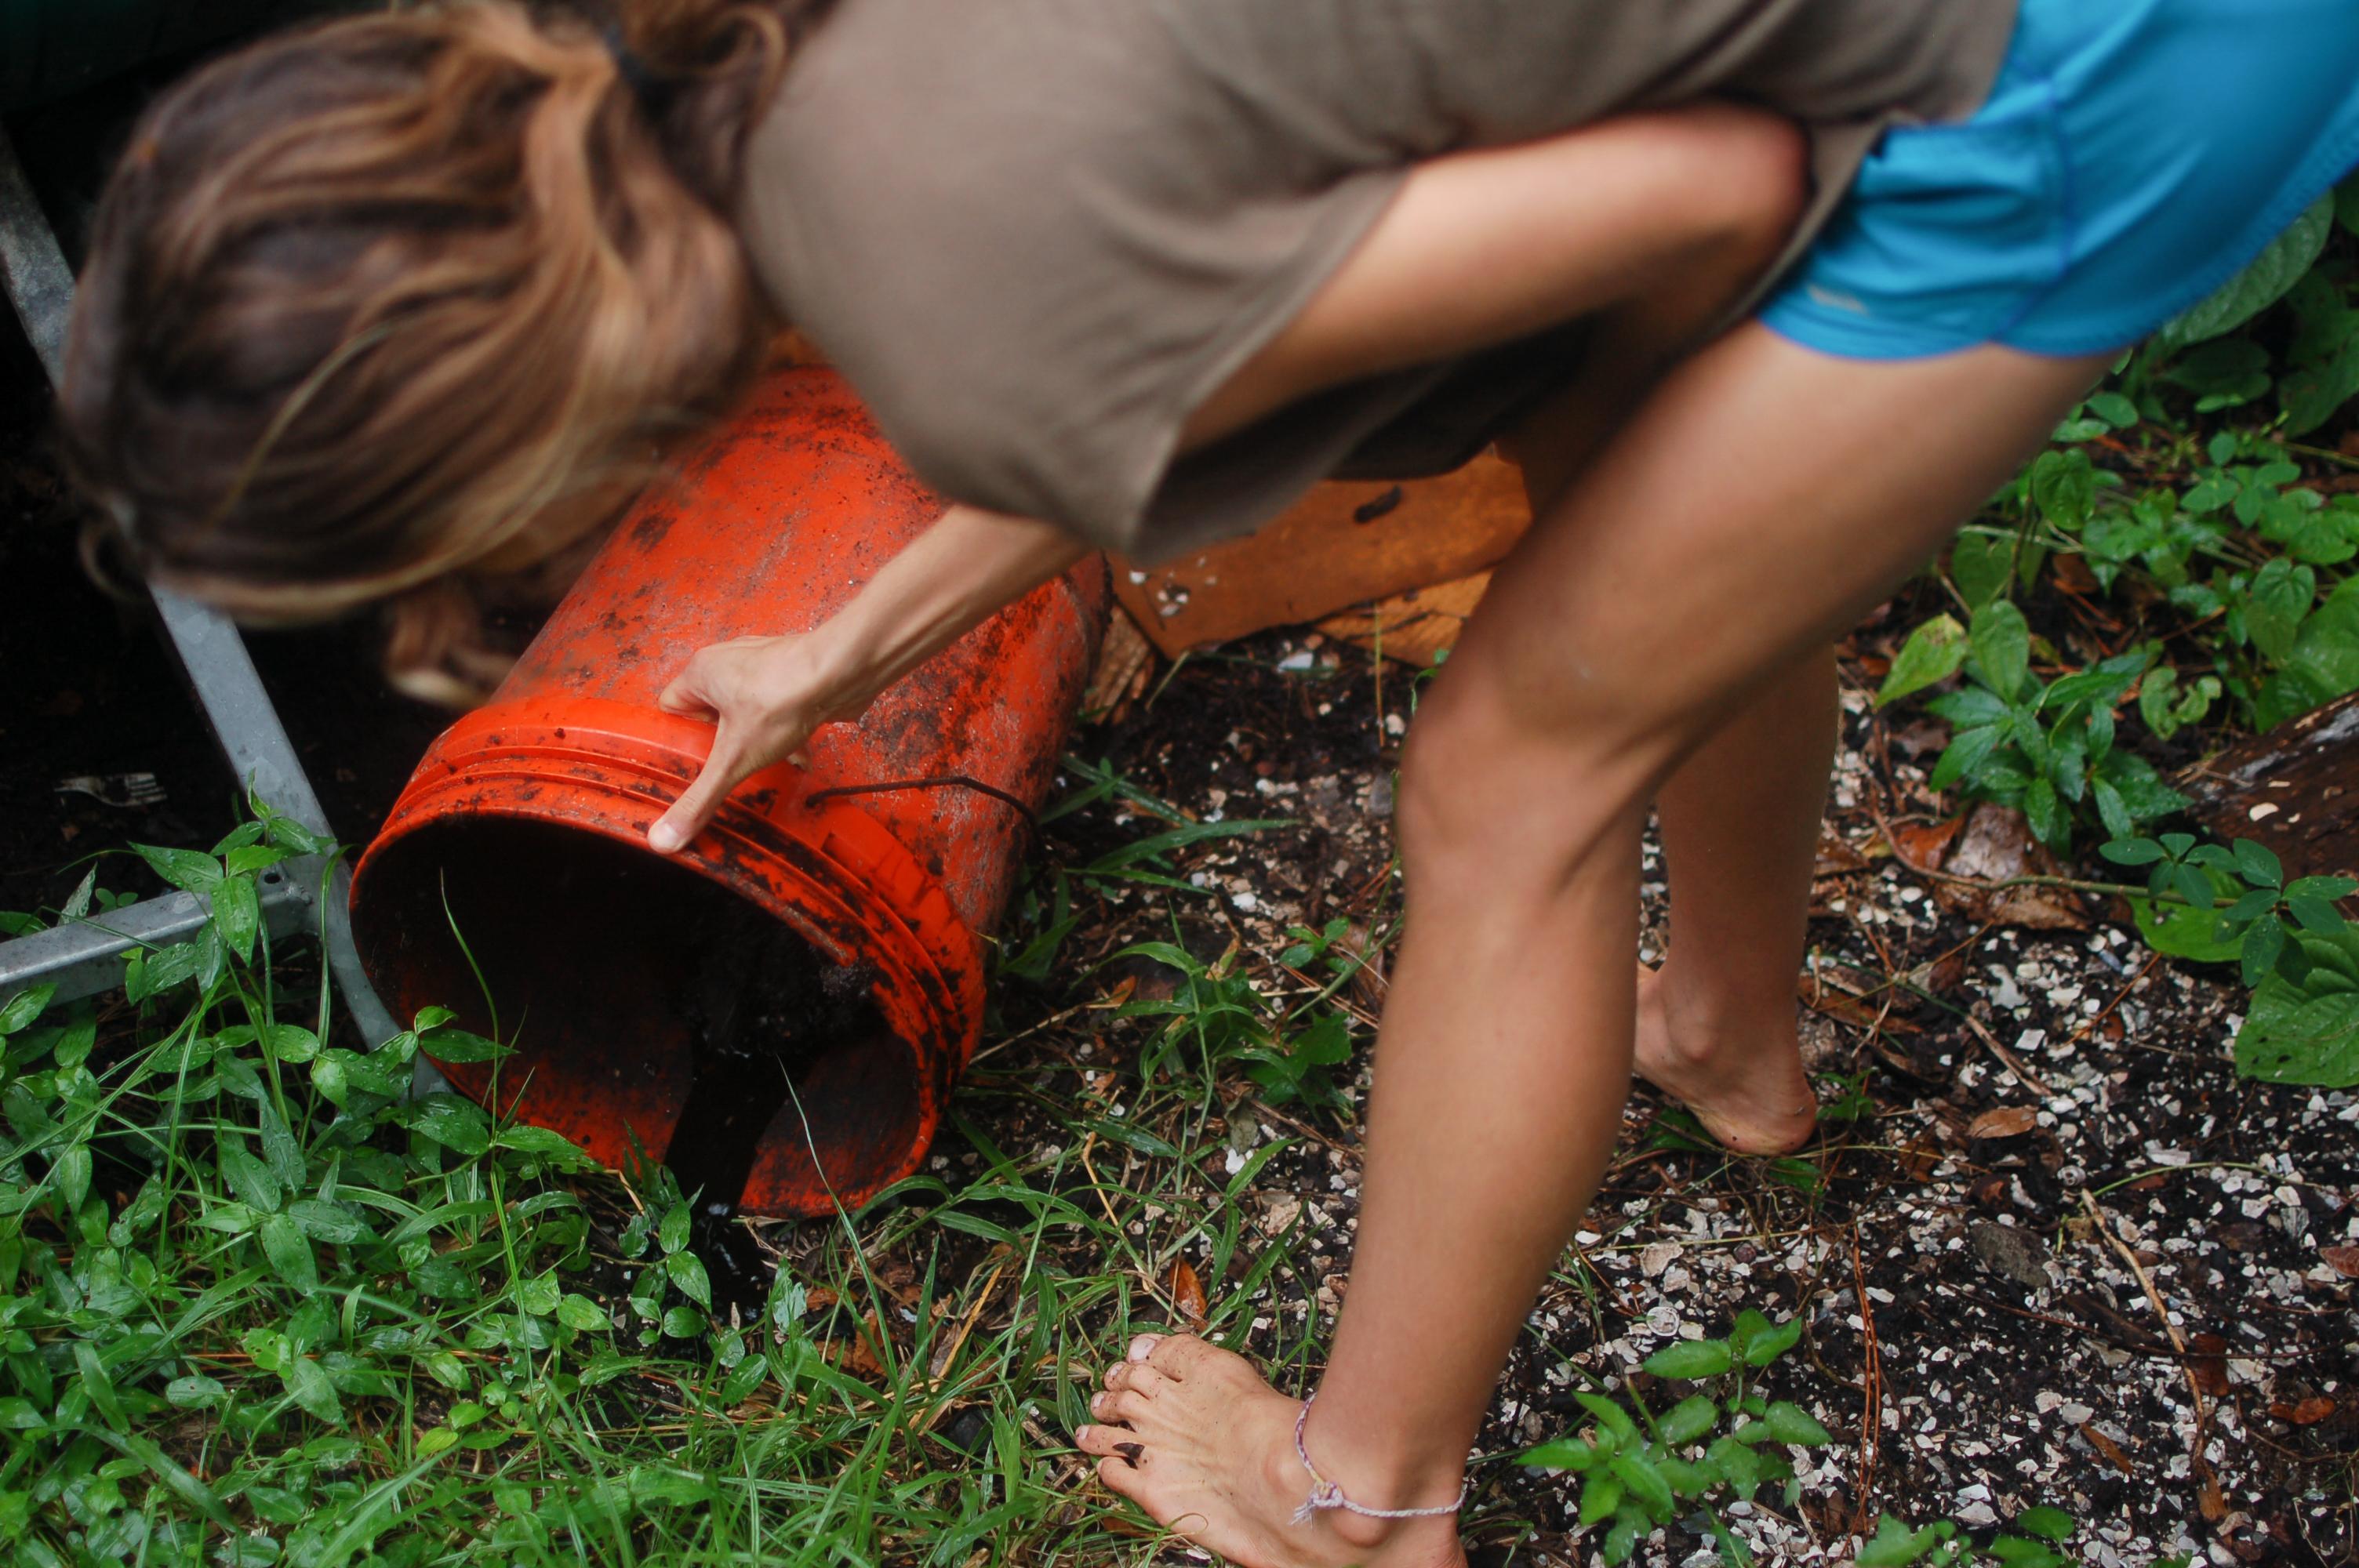 Compost, condoms and coconuts: Compost tutorial keeps campus green